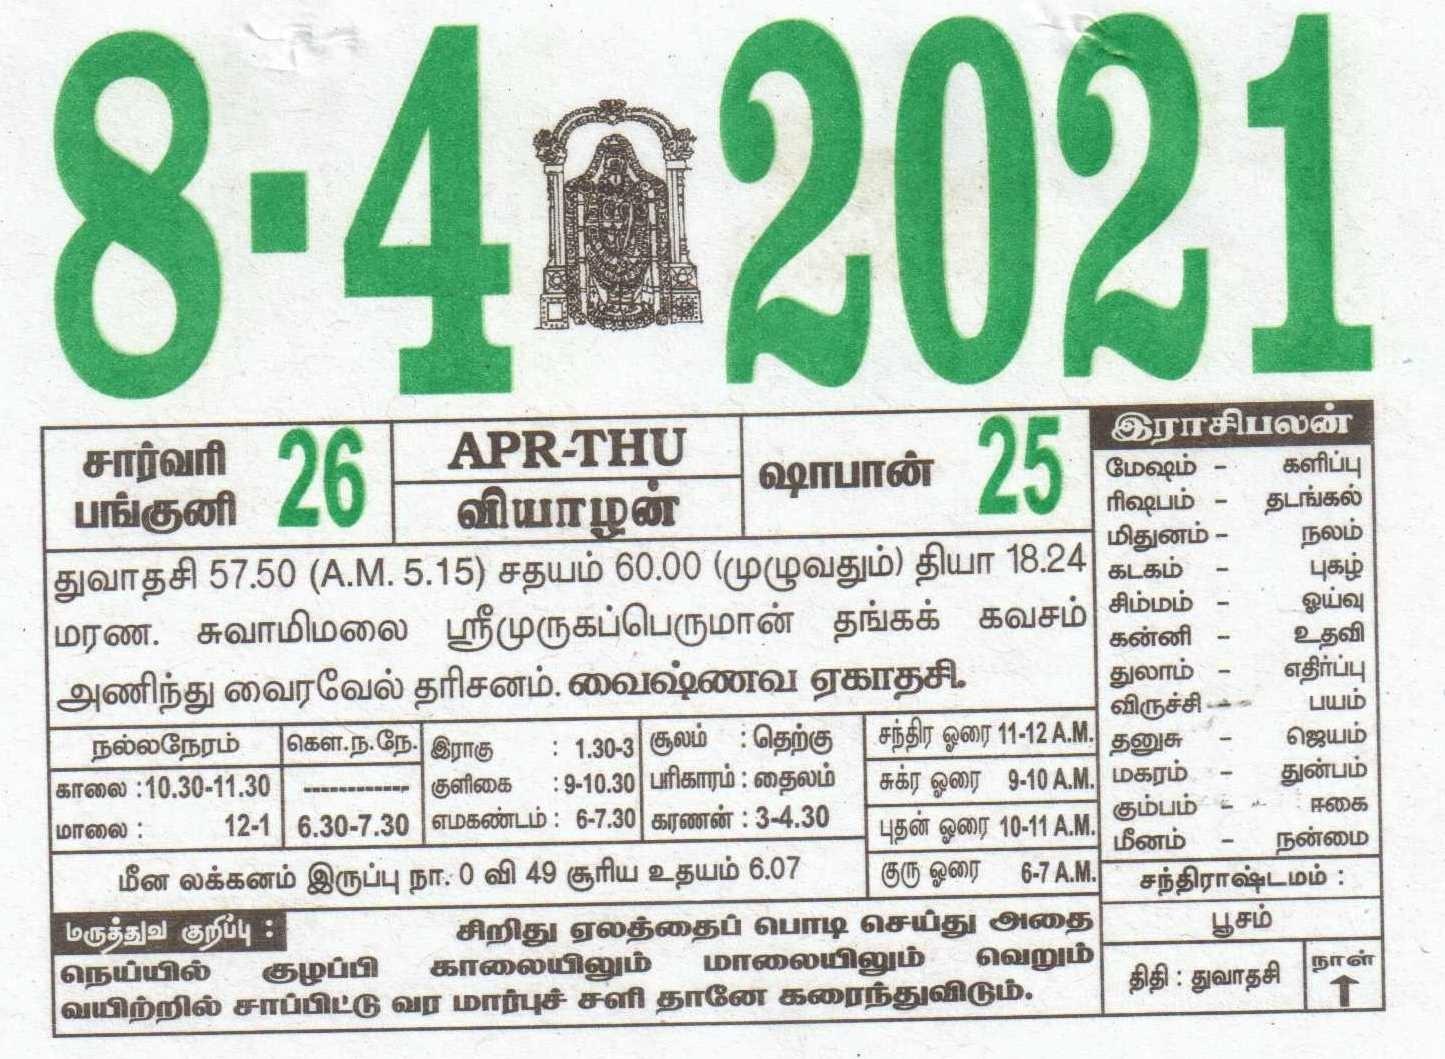 08-04-2021 Daily Calendar | Date 08 , January Daily Tear Off Calendar | Daily Panchangam Rasi Palan Marriage Dates In November 2021 Hindu Calendar